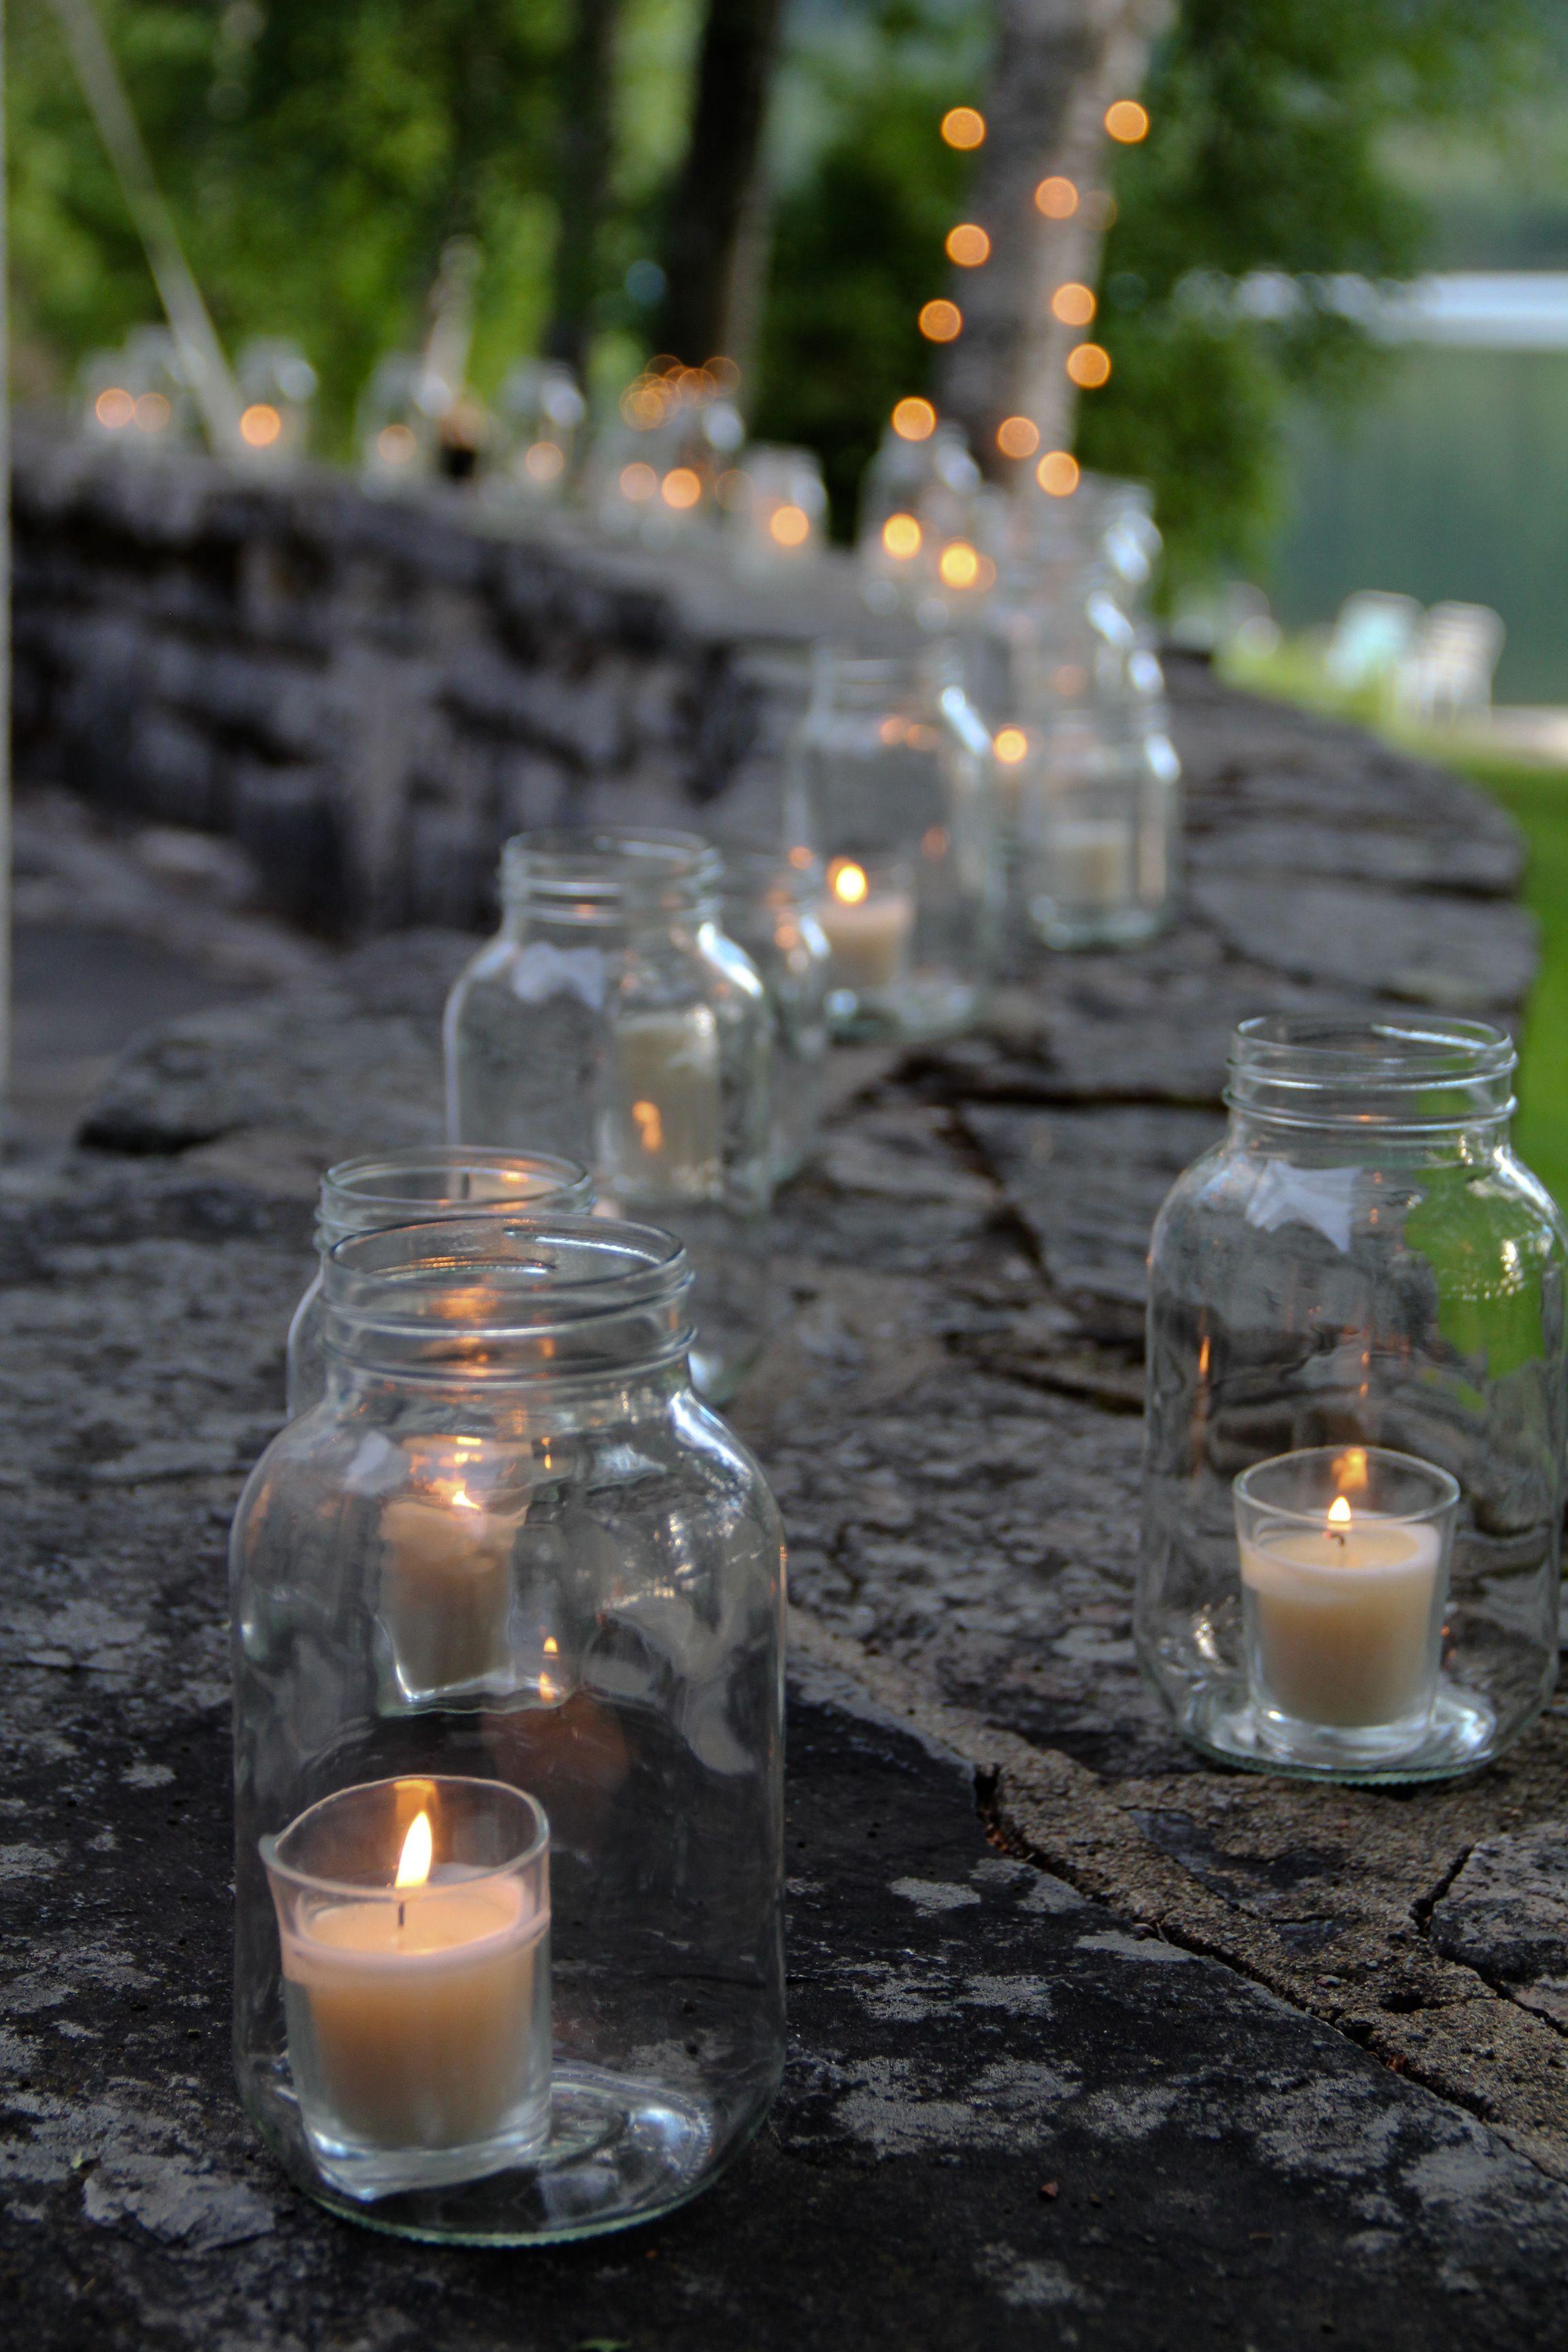 Wedding light decoration ideas  Outdoor Wedding Lighting  Immagina puoi  Pinterest  Wedding